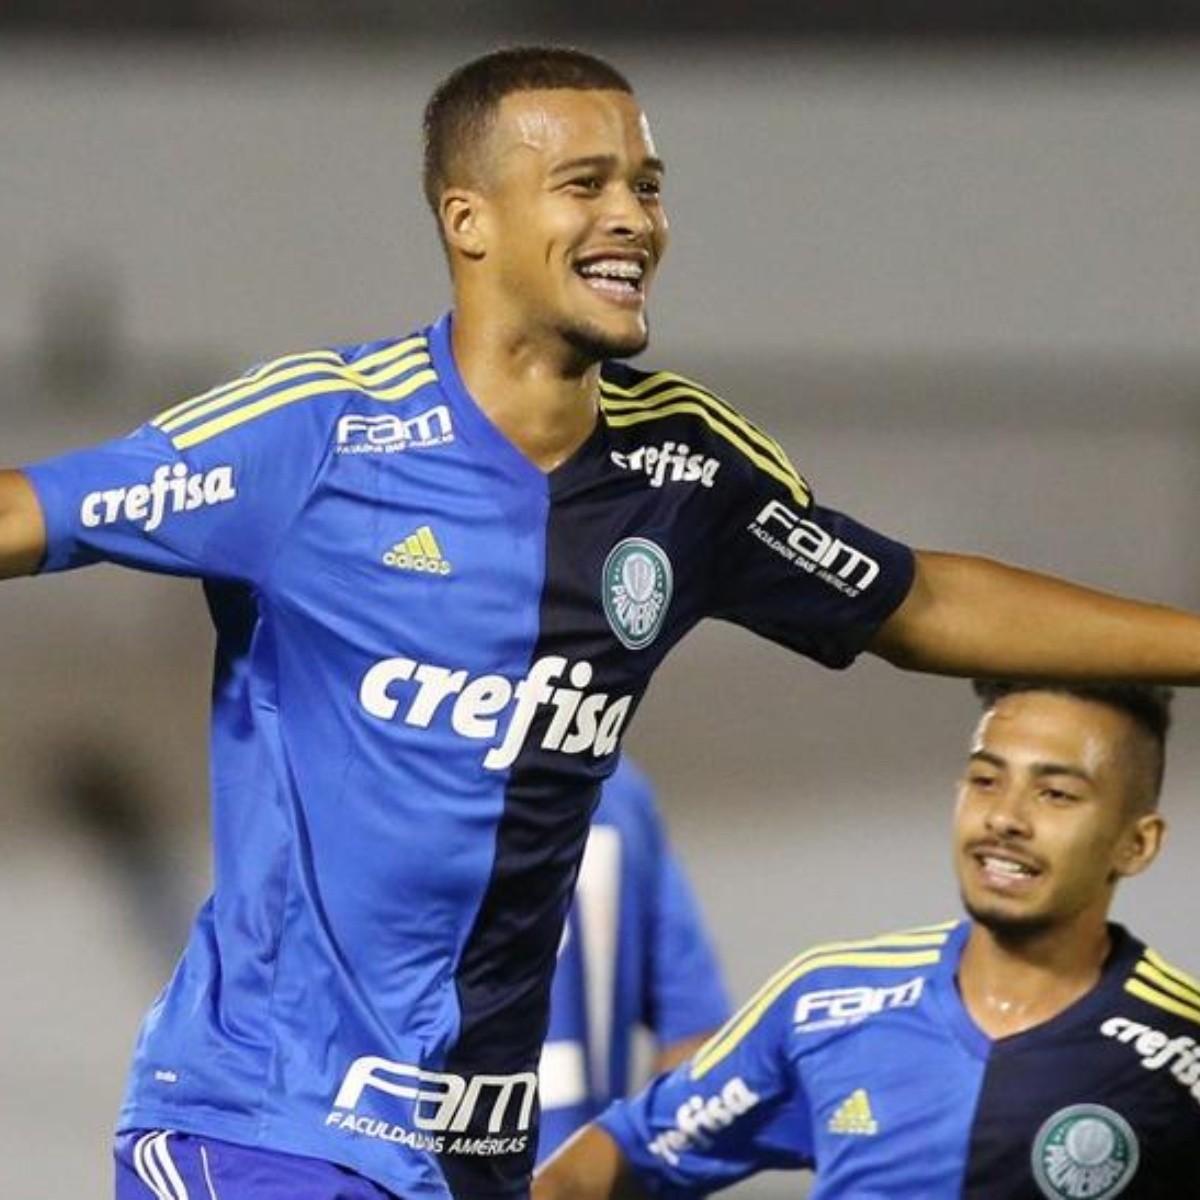 Luxa Da Aval E Palmeiras Fica Proximo De Negociar Joia Com O Figueirense Moldes Do Acordo Sao Definidos Bolavip Brasil